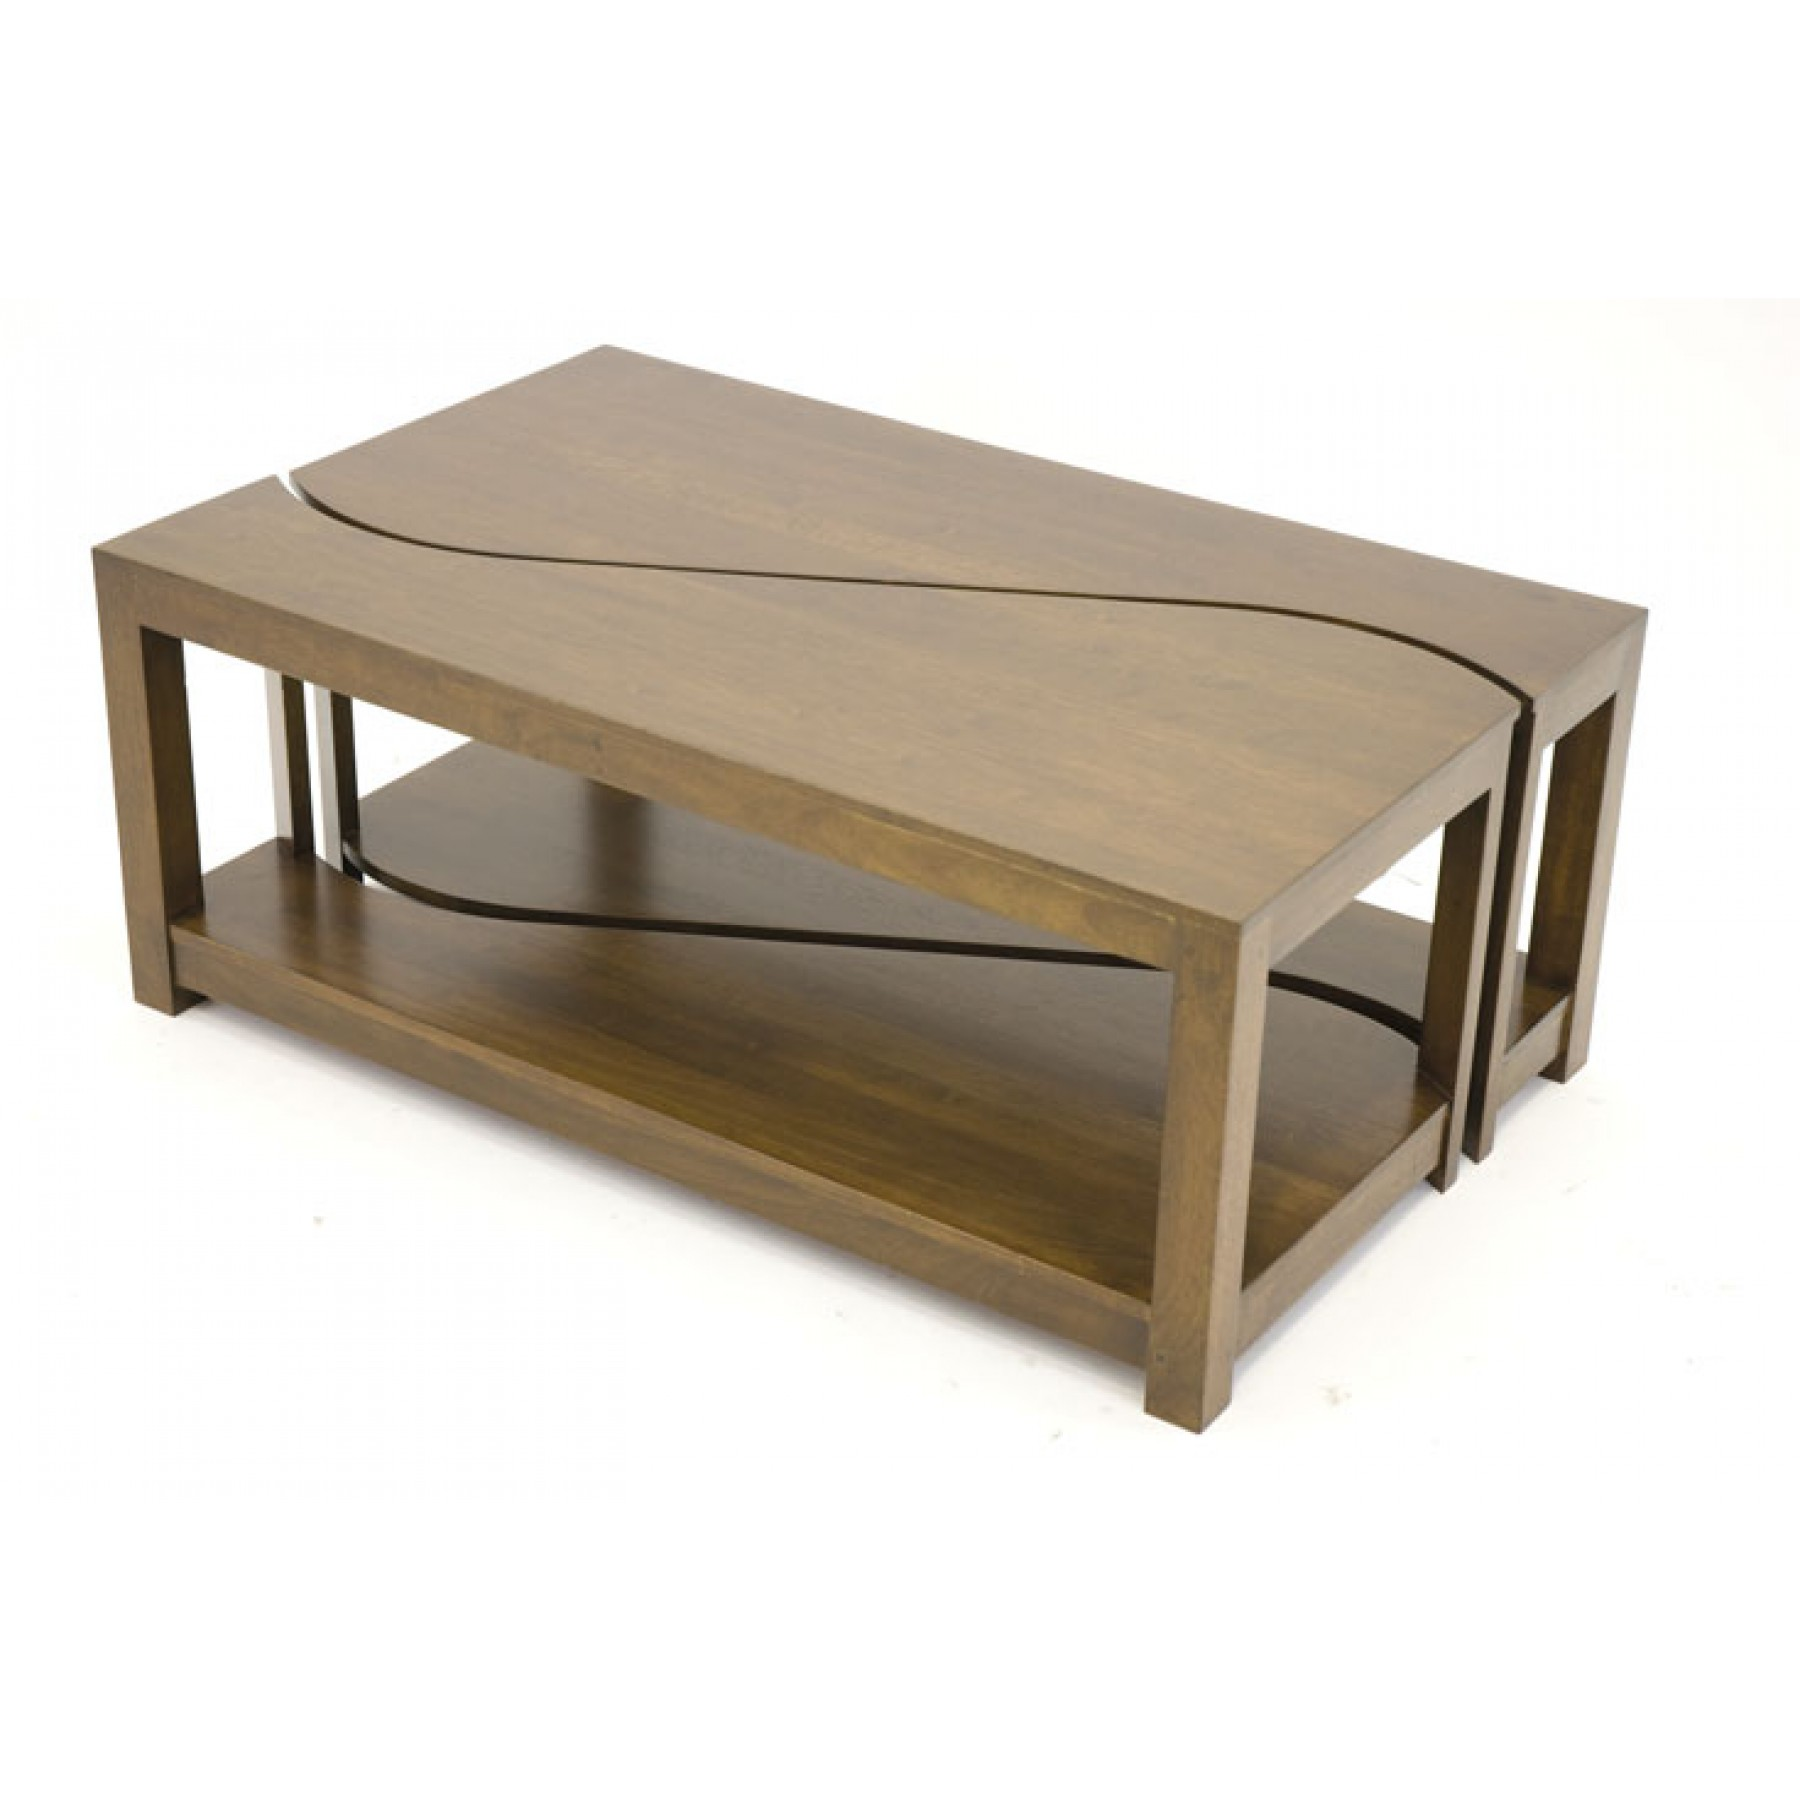 Table Rectangle 2 Design Éléments Kubu Nomadde Basse Par Mobilier 6vY7gybf